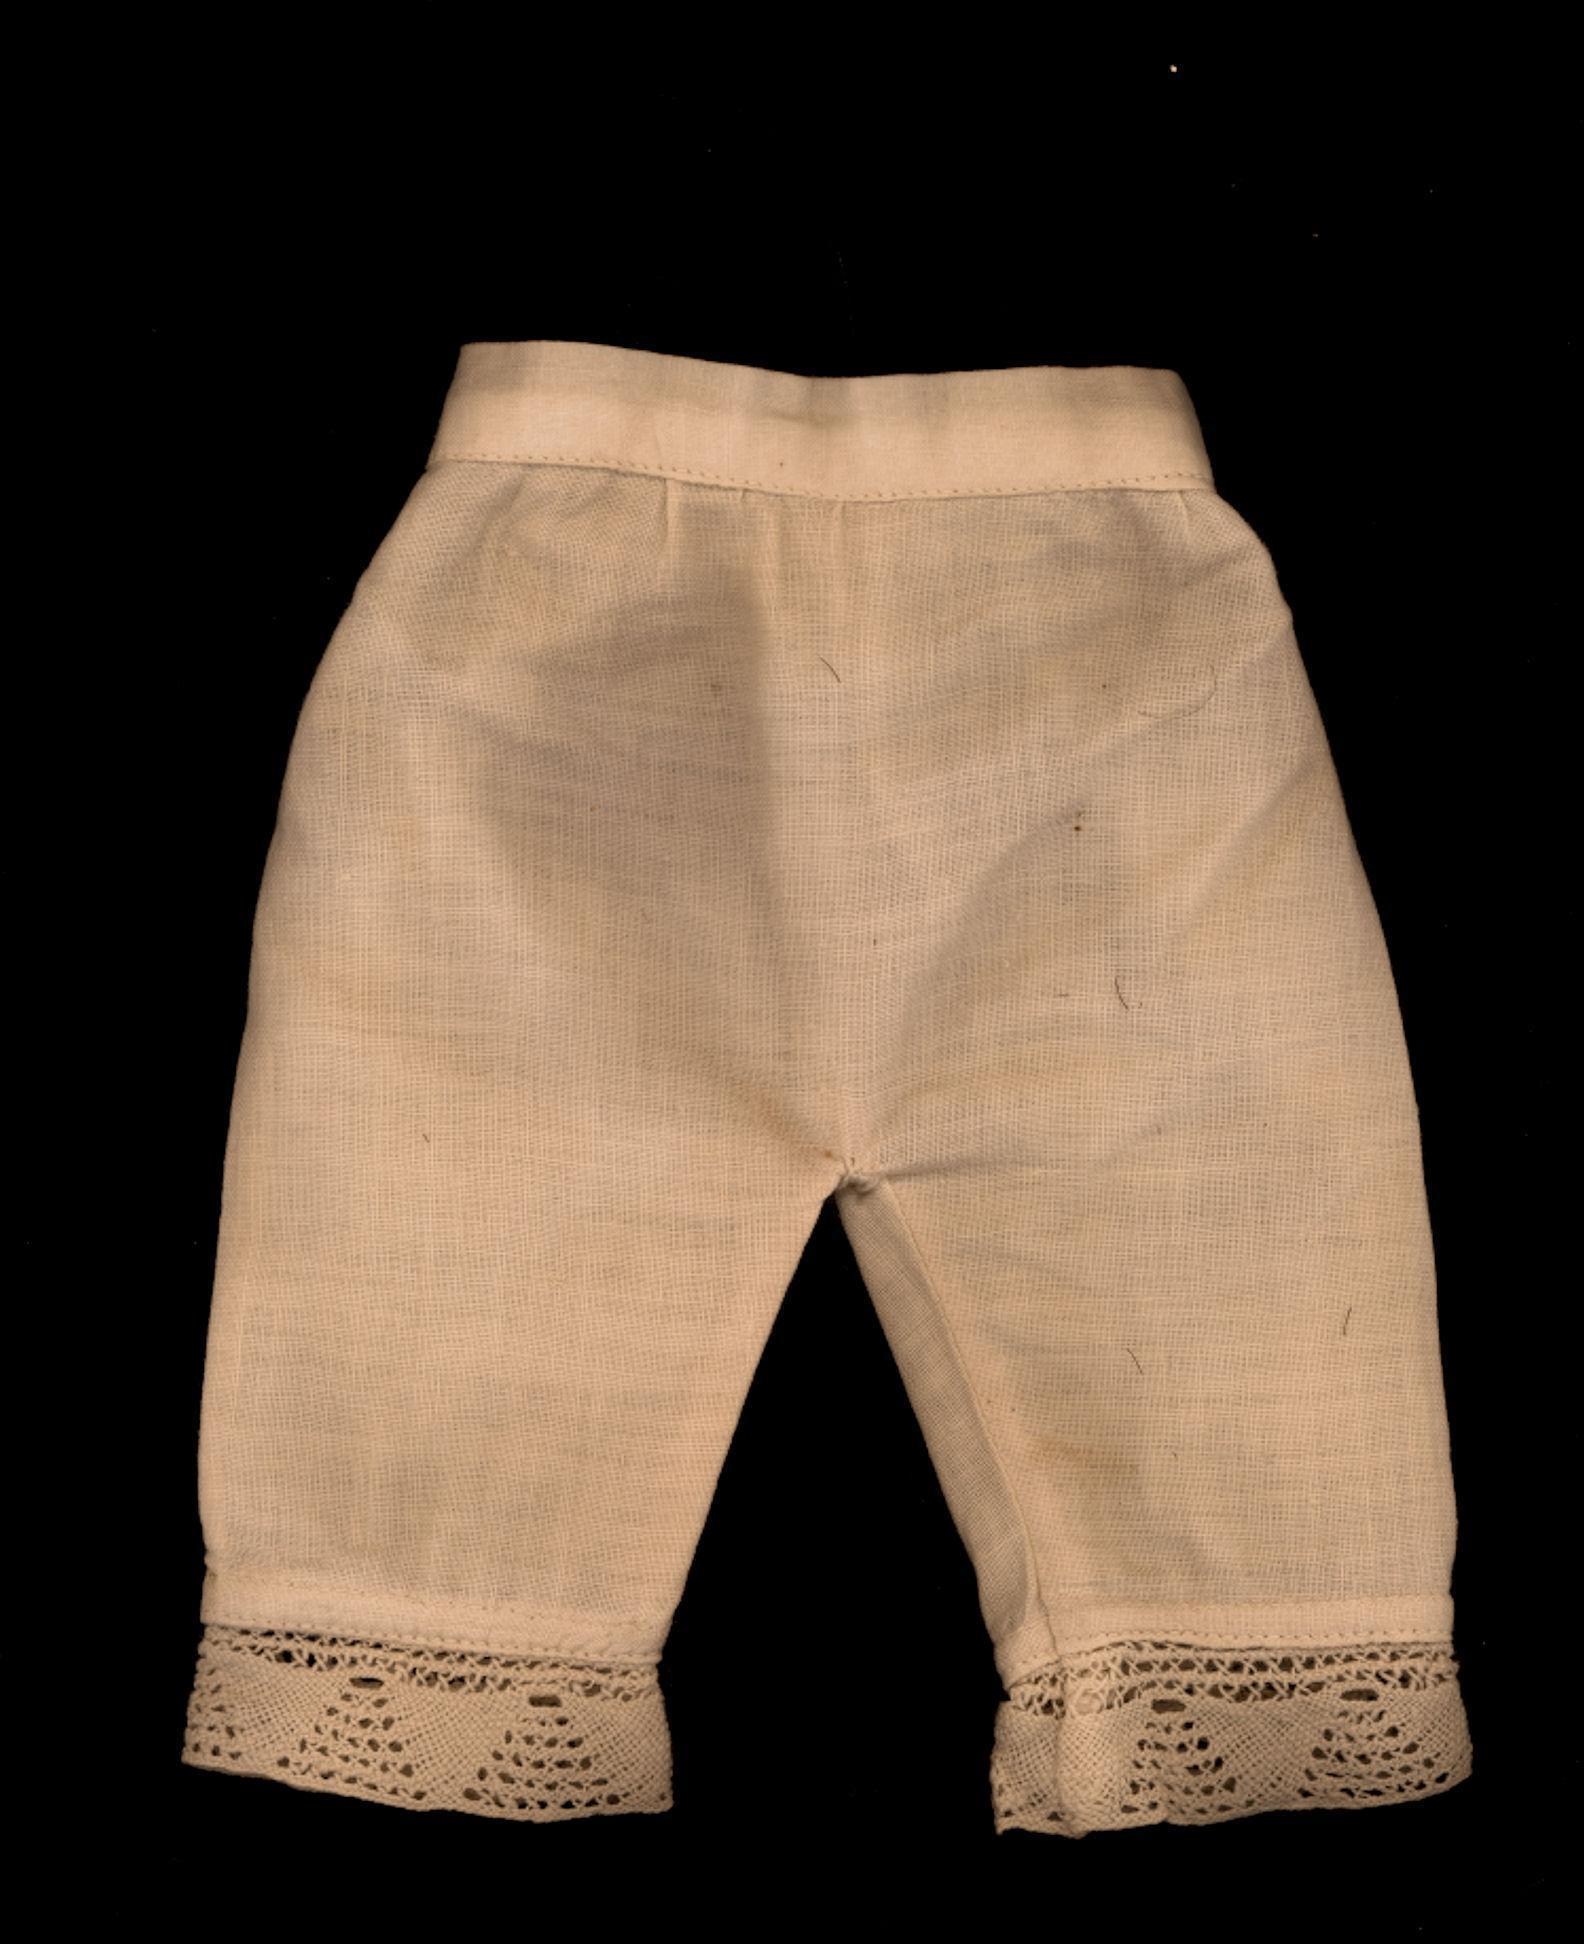 Antique Cream Cotton Doll Pantaloons with Crochet Trim